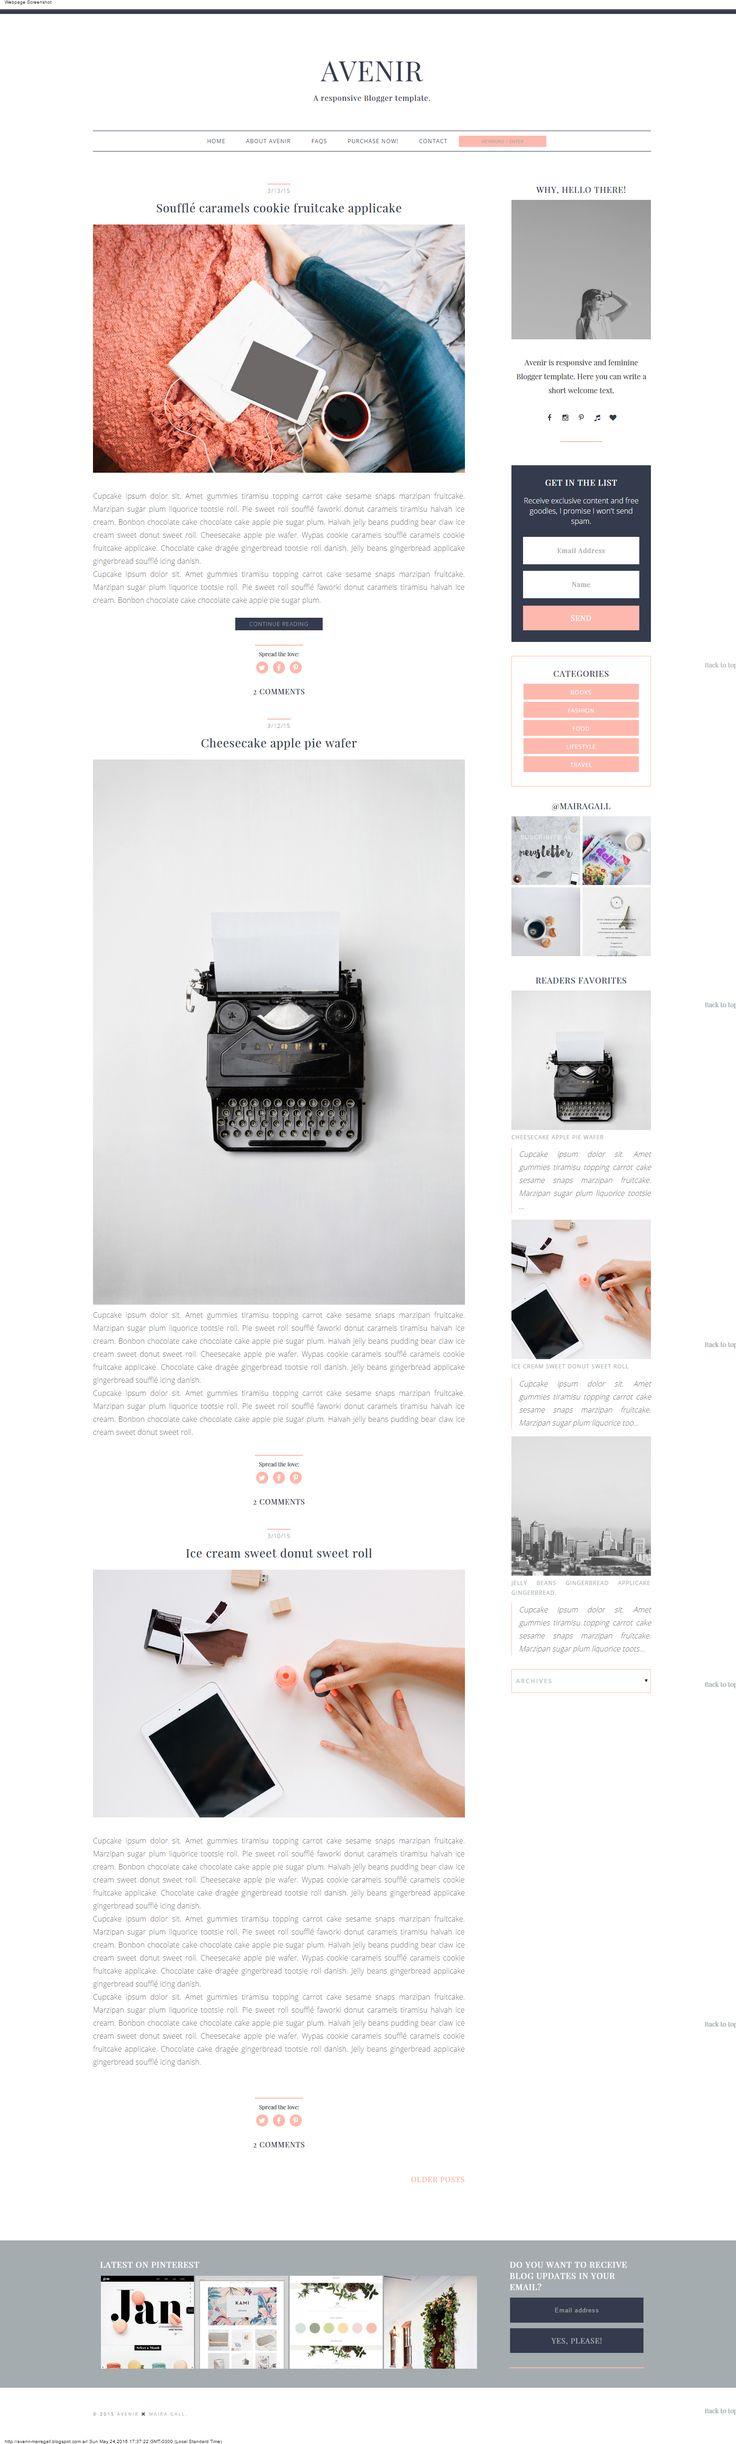 486 best WordPress themes images on Pinterest | Design websites ...